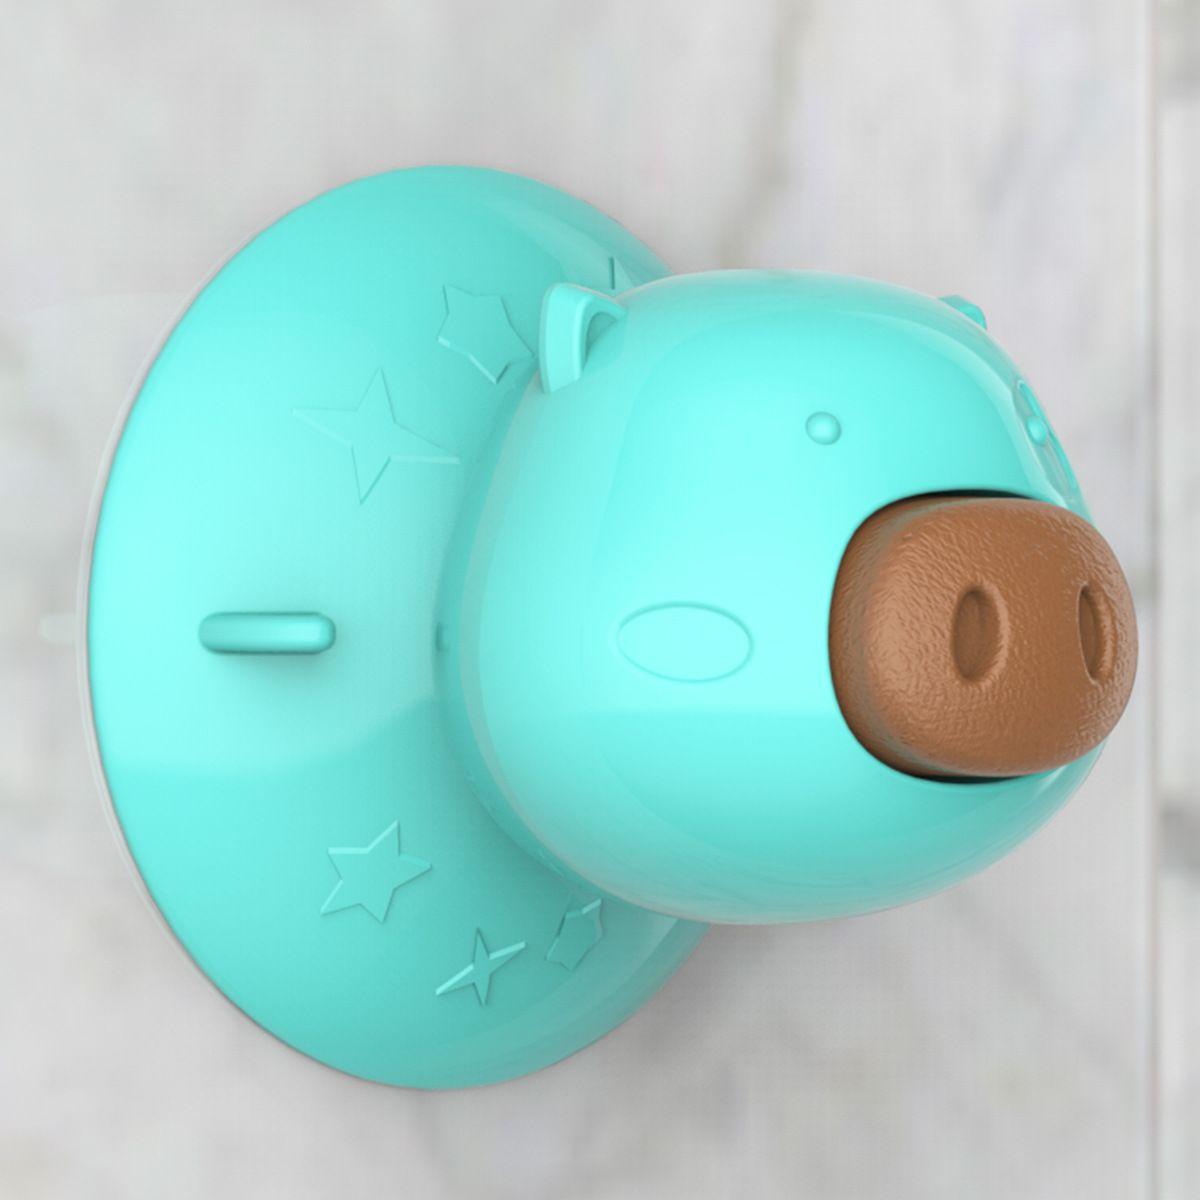 Cute Pet Supplies Hot Selling Sucker Hundespielzeug lecken Geschirr Lecken Platte Zahnen Kekse Educational beißfest Gummi